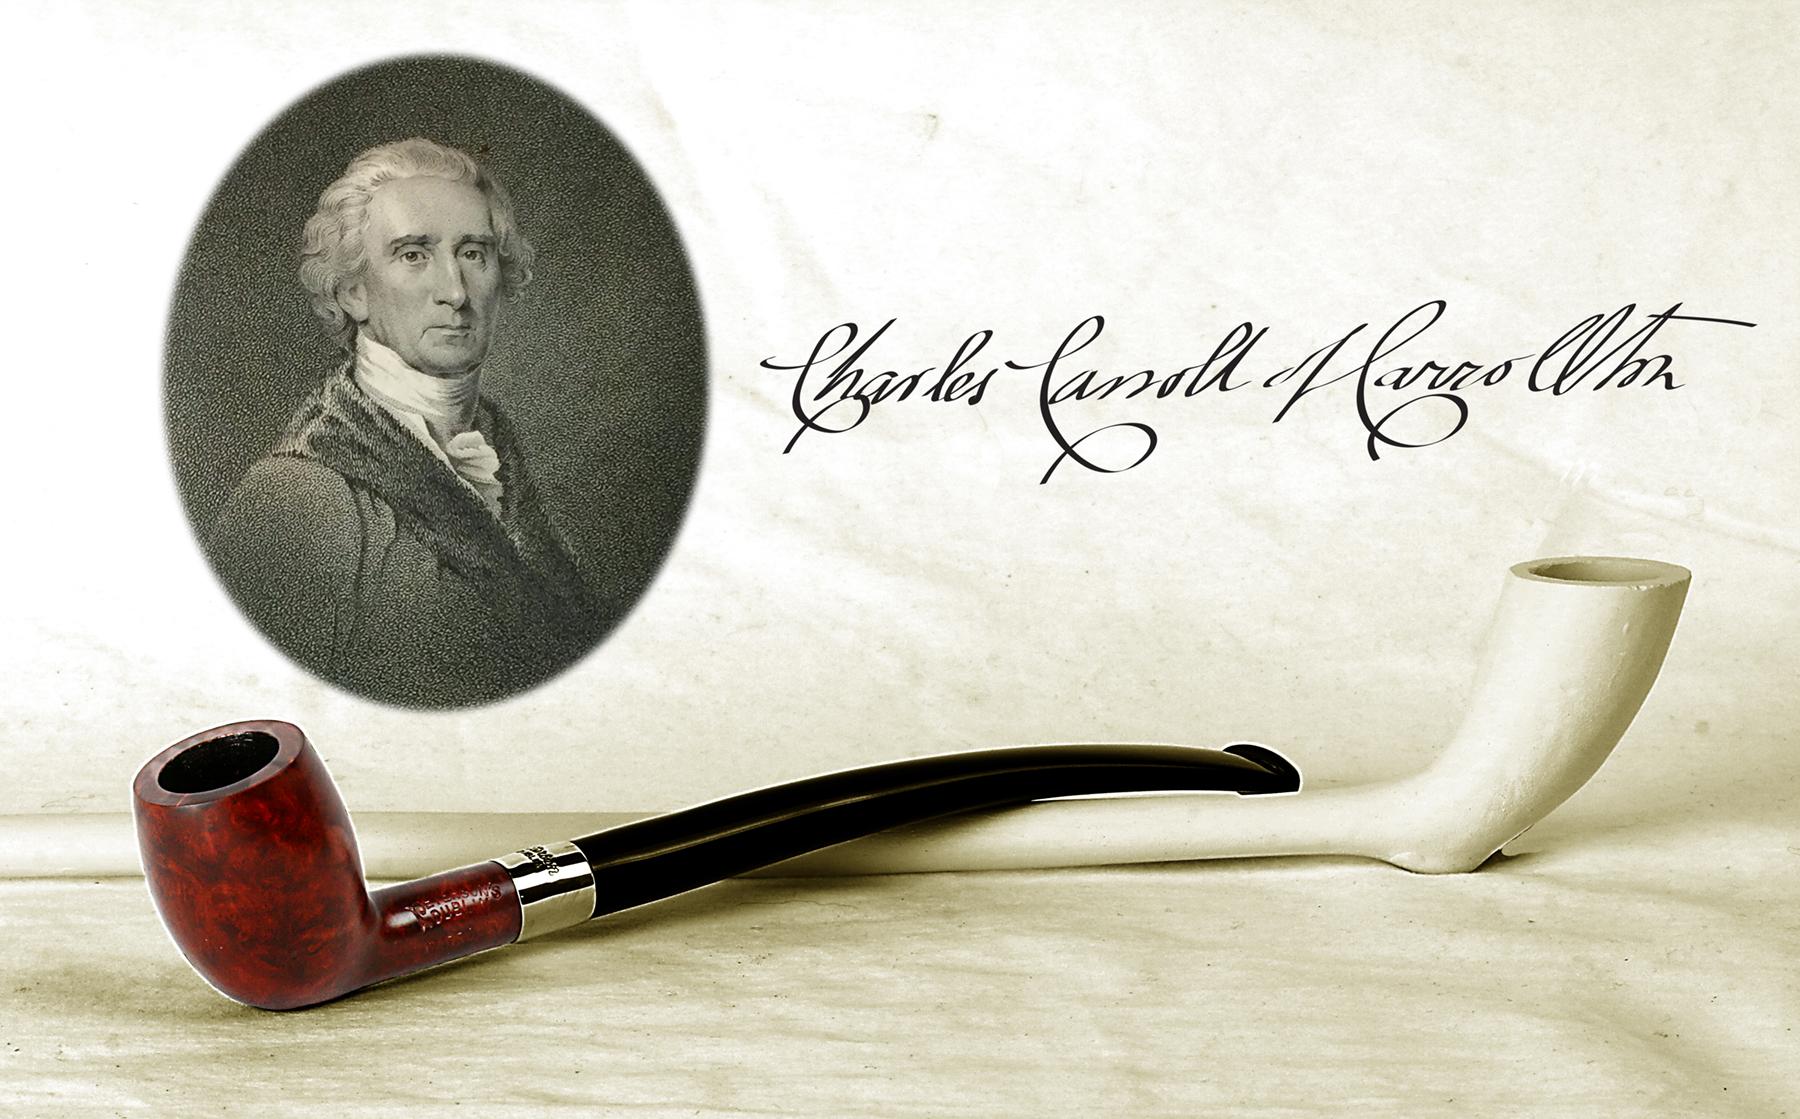 234. The Carroll of Carrollton Limited Edition